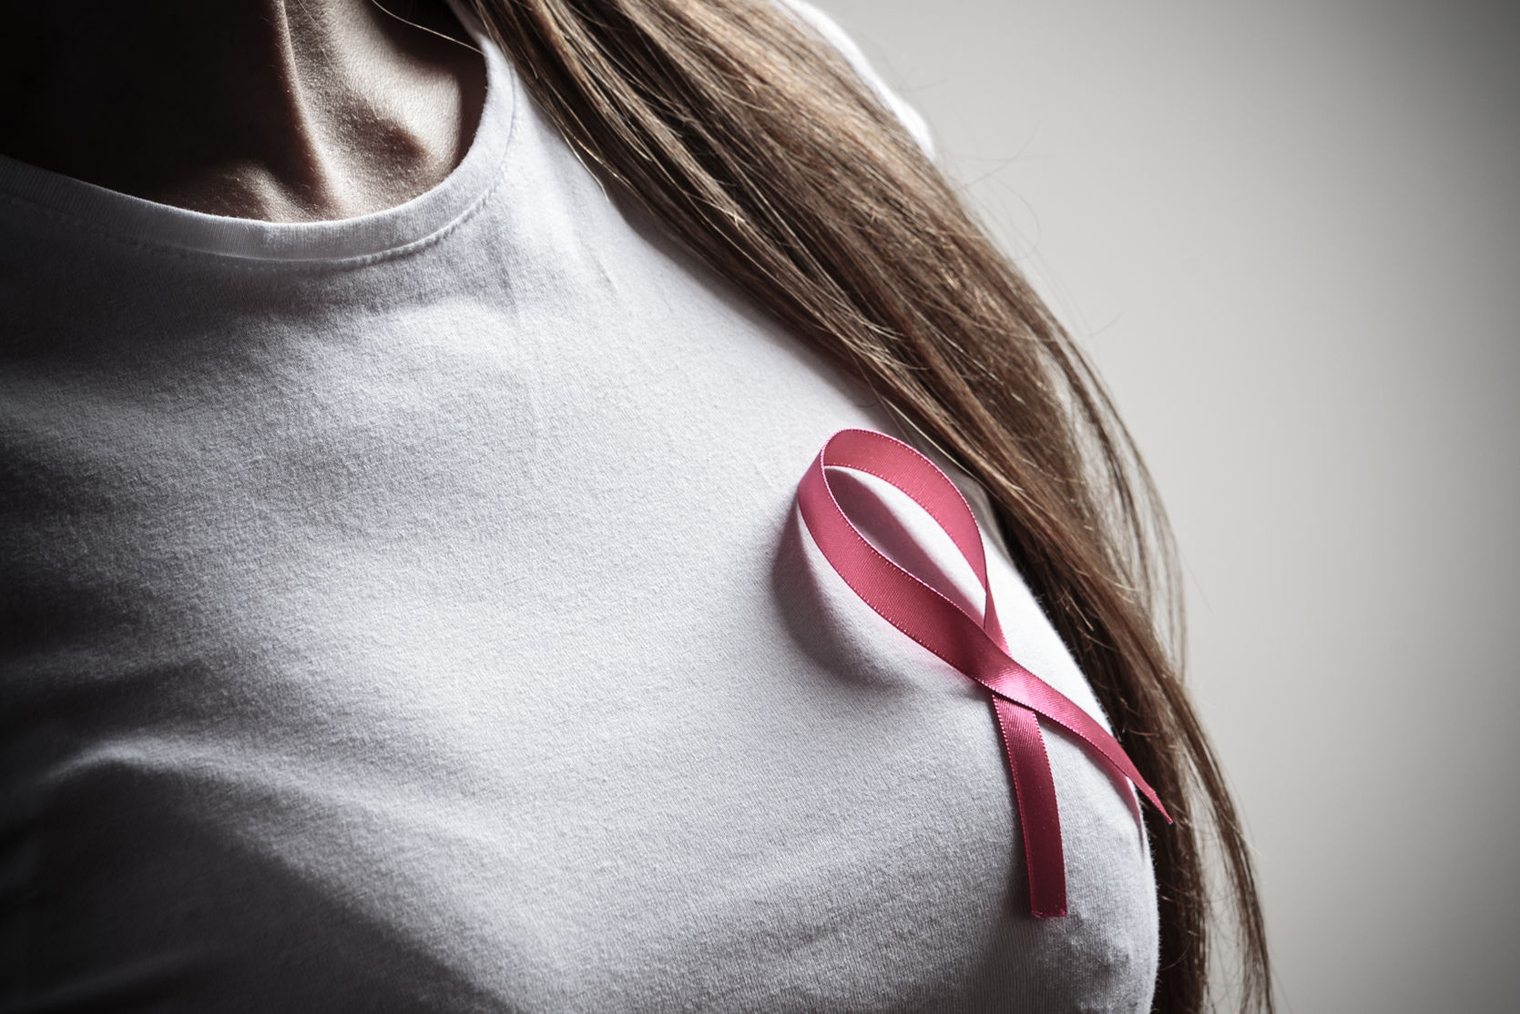 Physiothérapie et cancer du sein